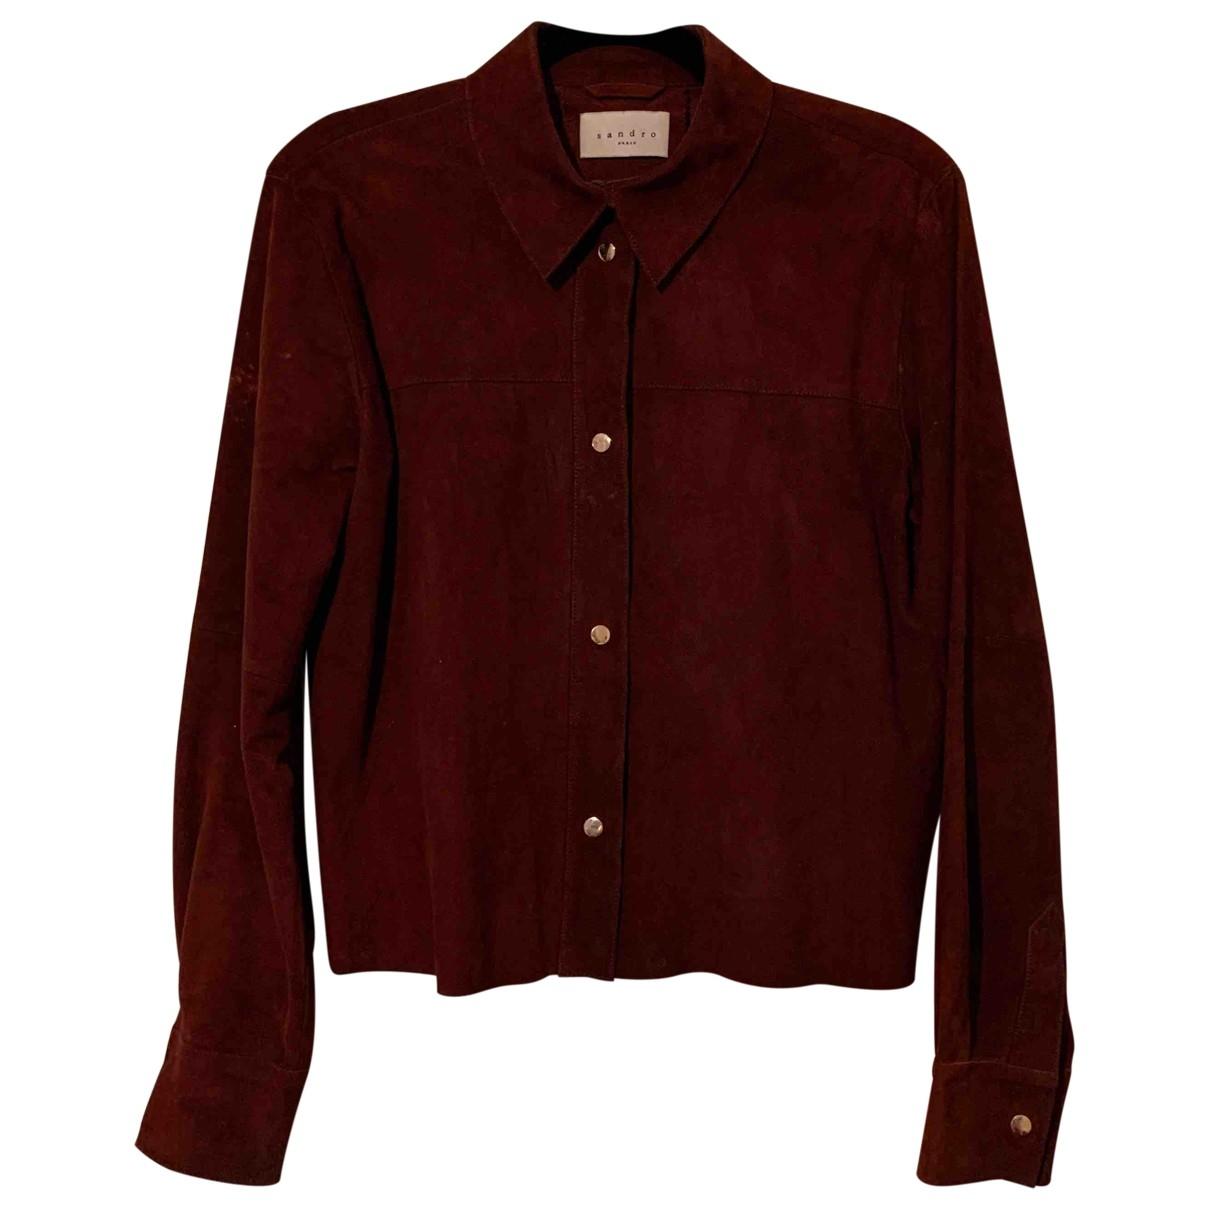 Sandro \N Burgundy Suede jacket for Women 8 UK